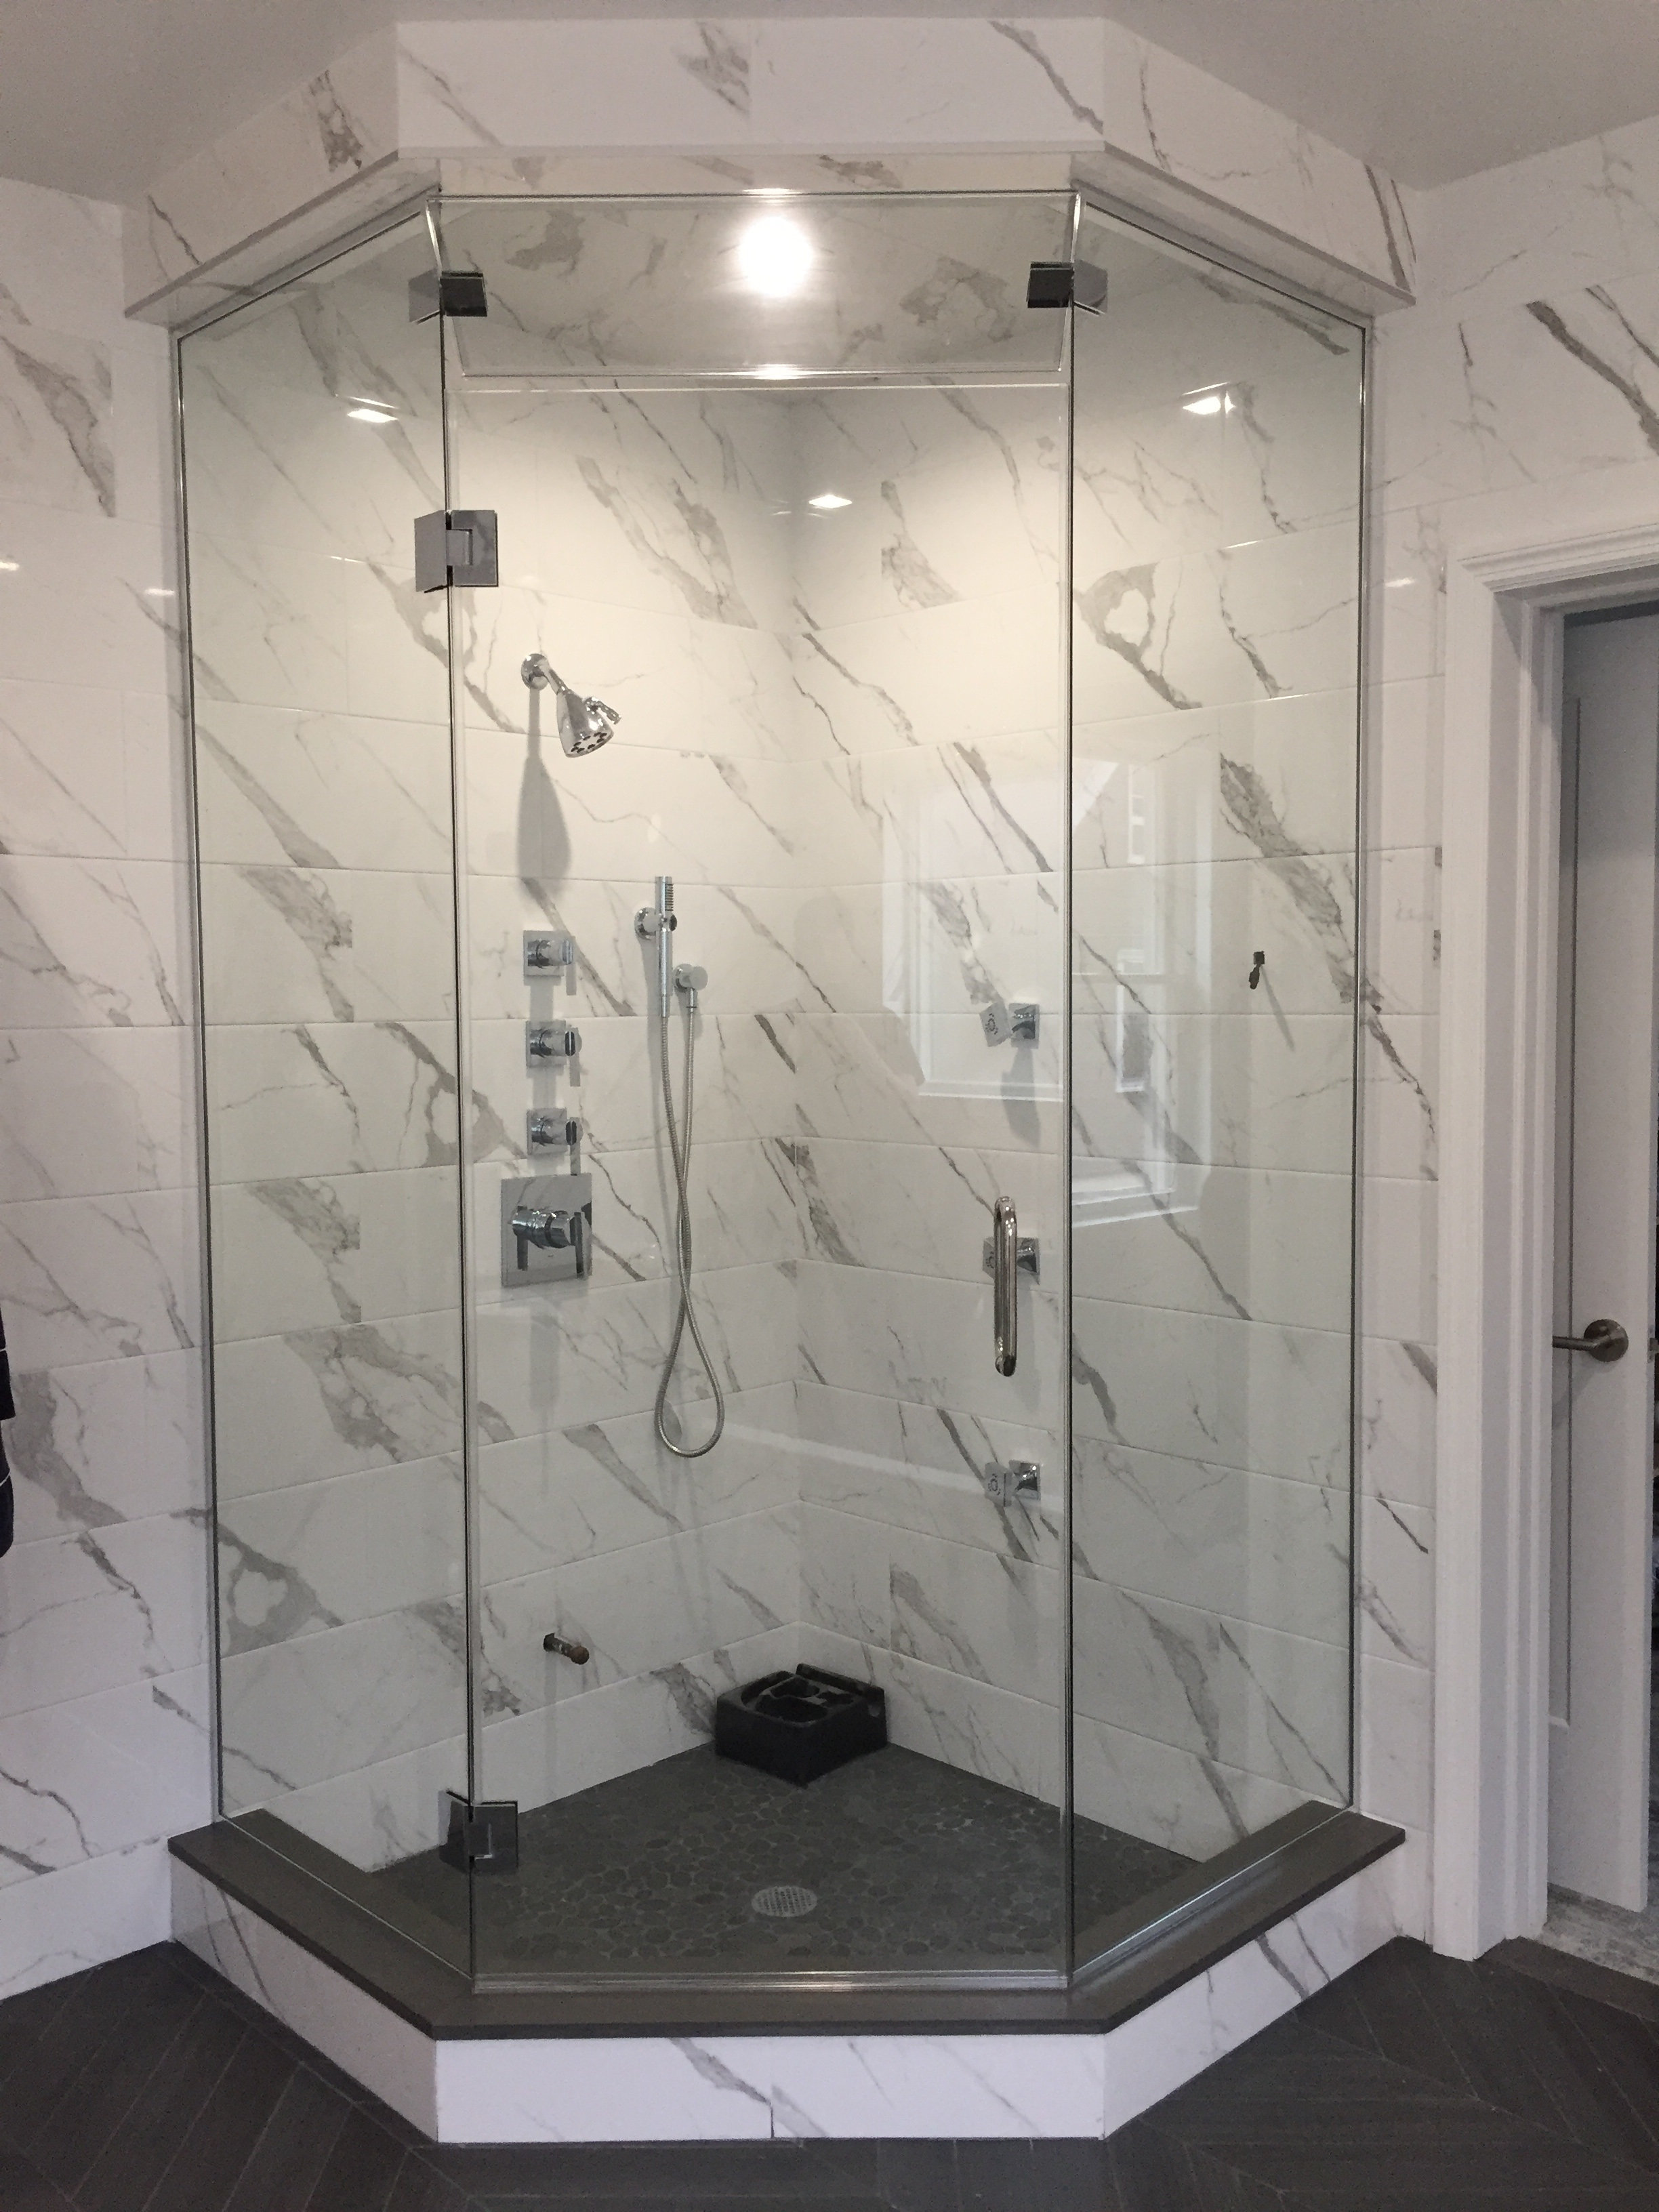 Quality Shower Enclosures image | Quality Shower Enclosures